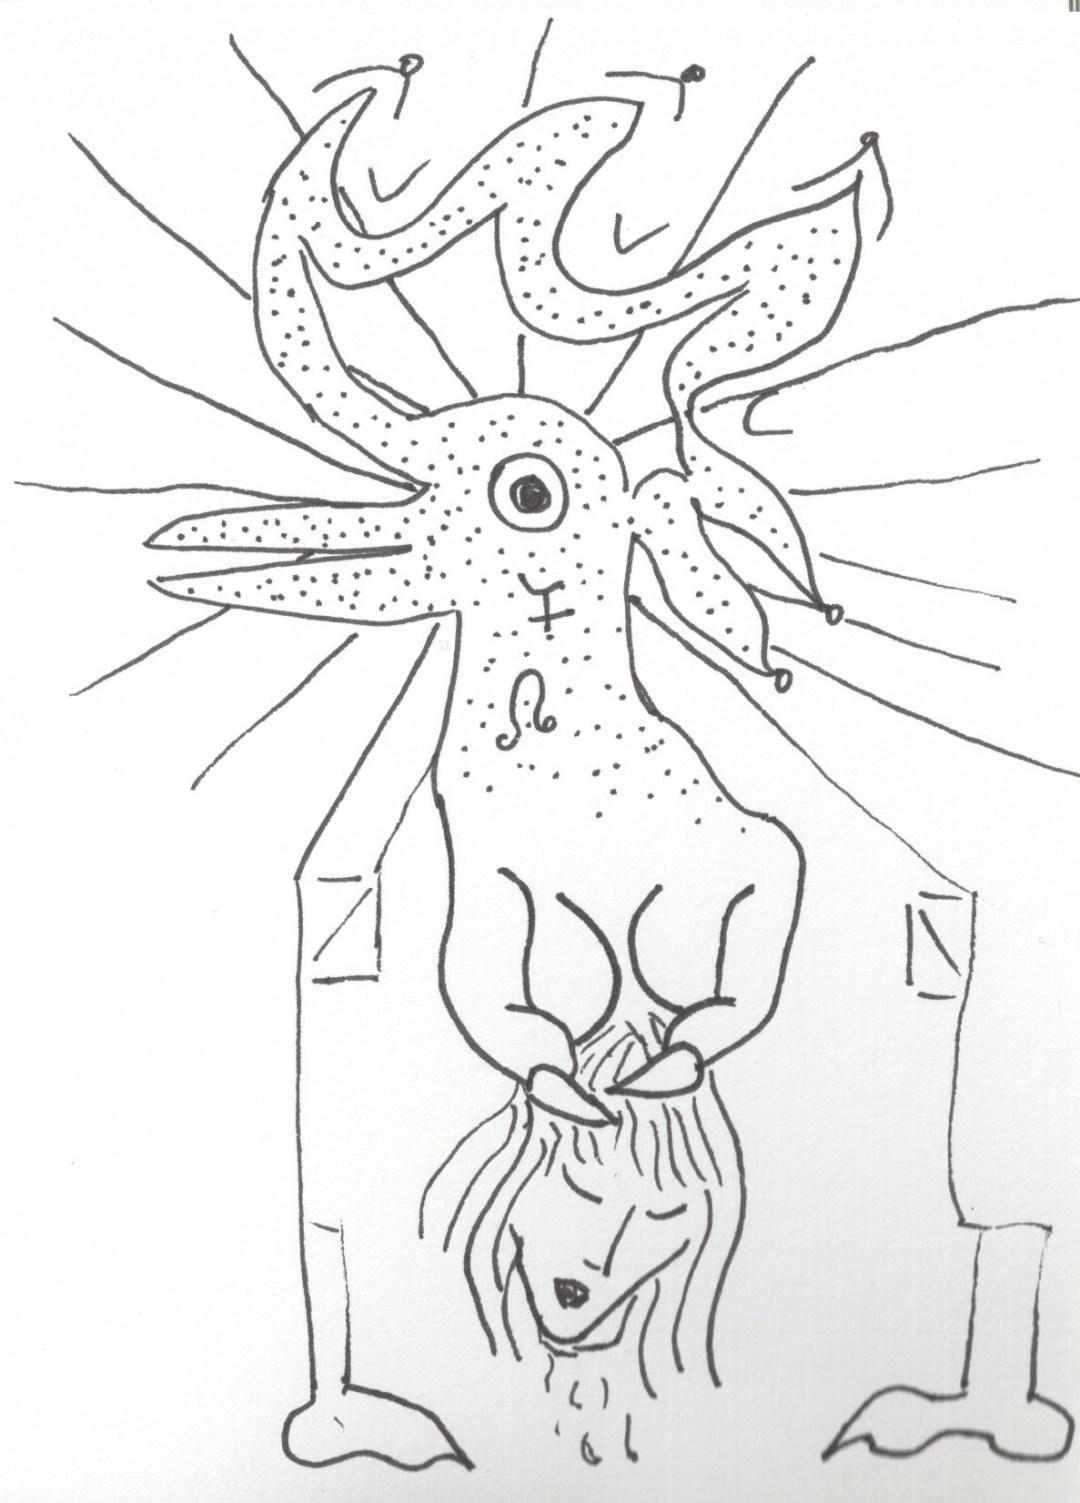 Ventnor corpse 181116b.jpeg